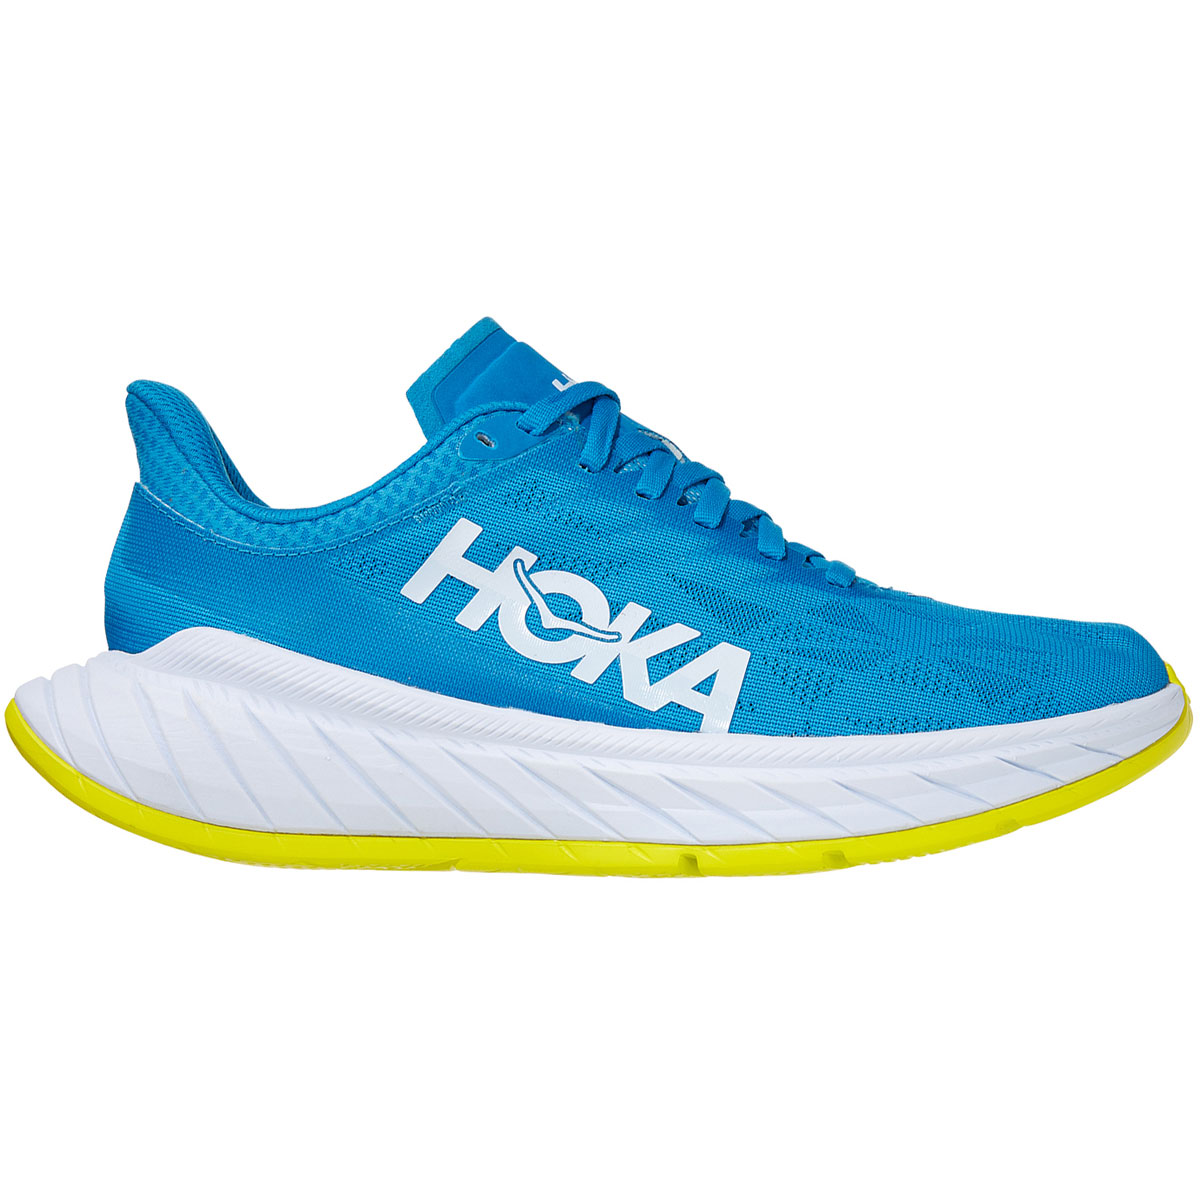 Women's Hoka One One Carbon X 2 Running Shoe - Color: Diva Blue/Citron - Size: 5 - Width: Regular, Diva Blue/Citron, large, image 1